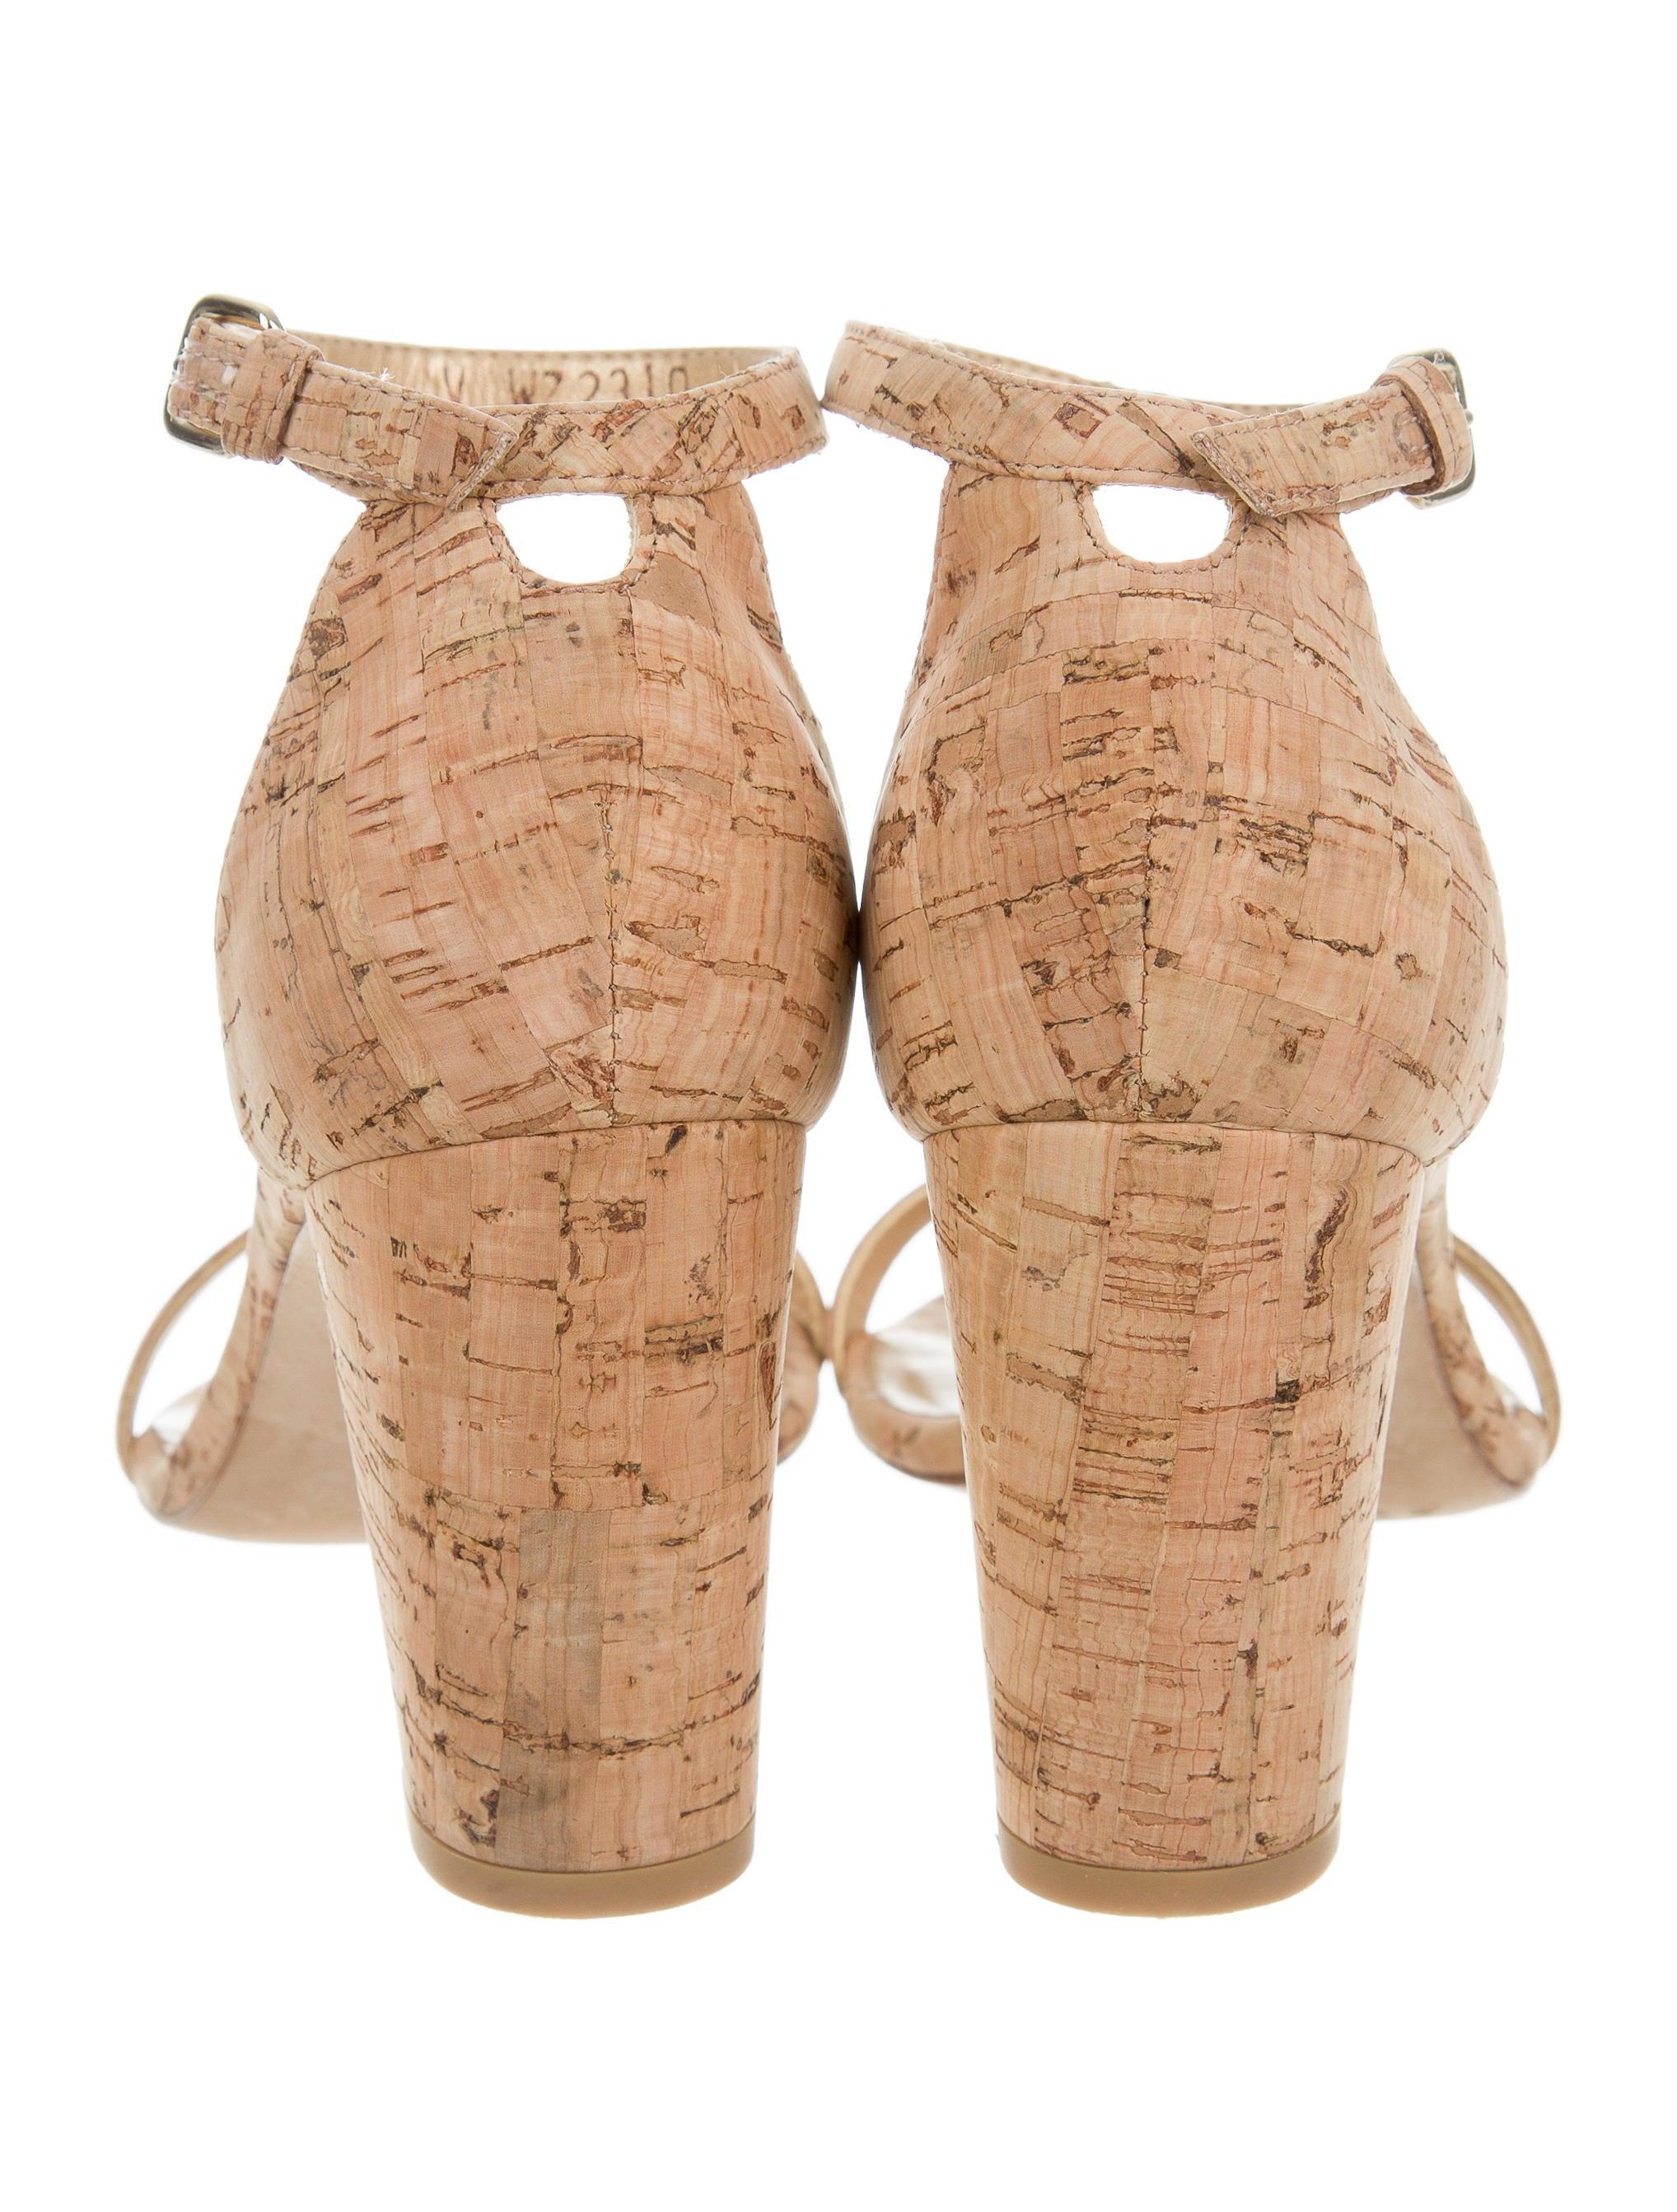 Stuart Weitzman Nearly Nude Sandals - Shoes - Wsu30754  The Realreal-9948